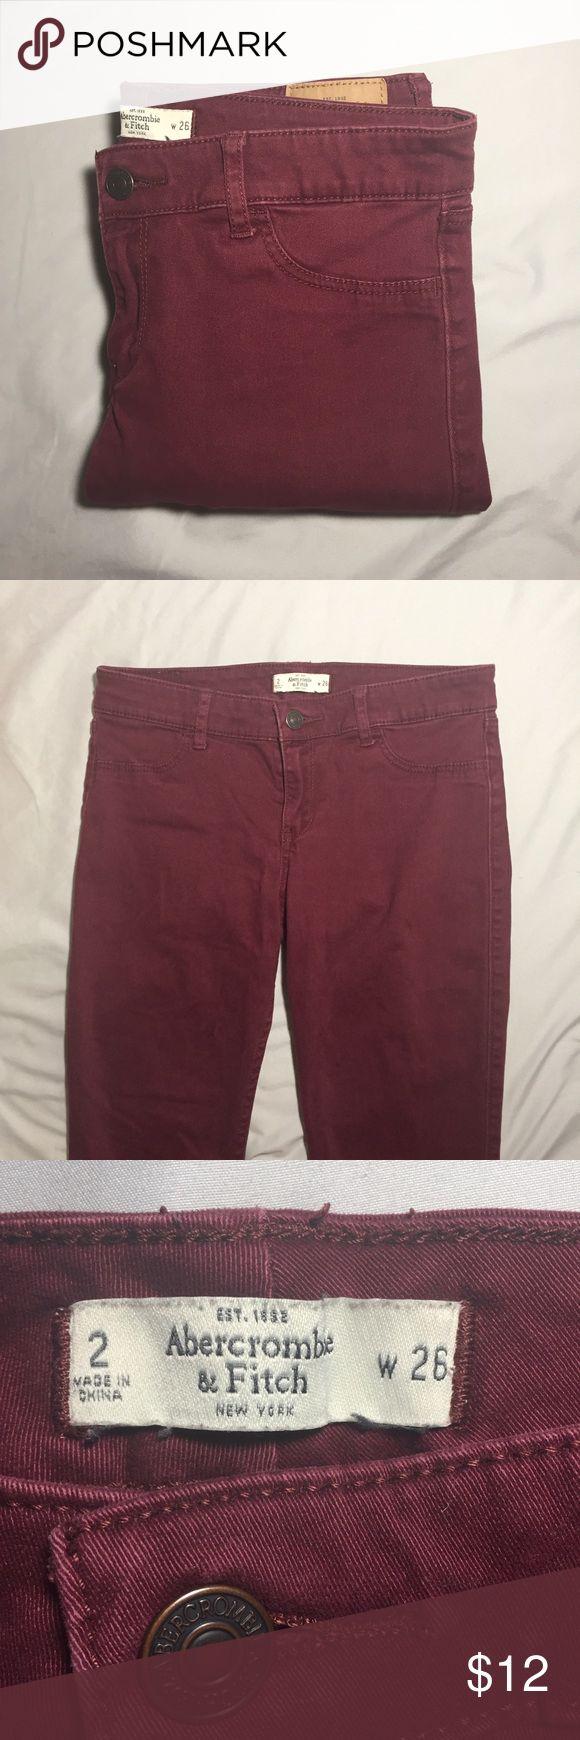 Abercrombie & Fitch maroon skinny jeans Abercrombie & Fitch maroon skinny jeans Abercrombie & Fitch Pants Skinny